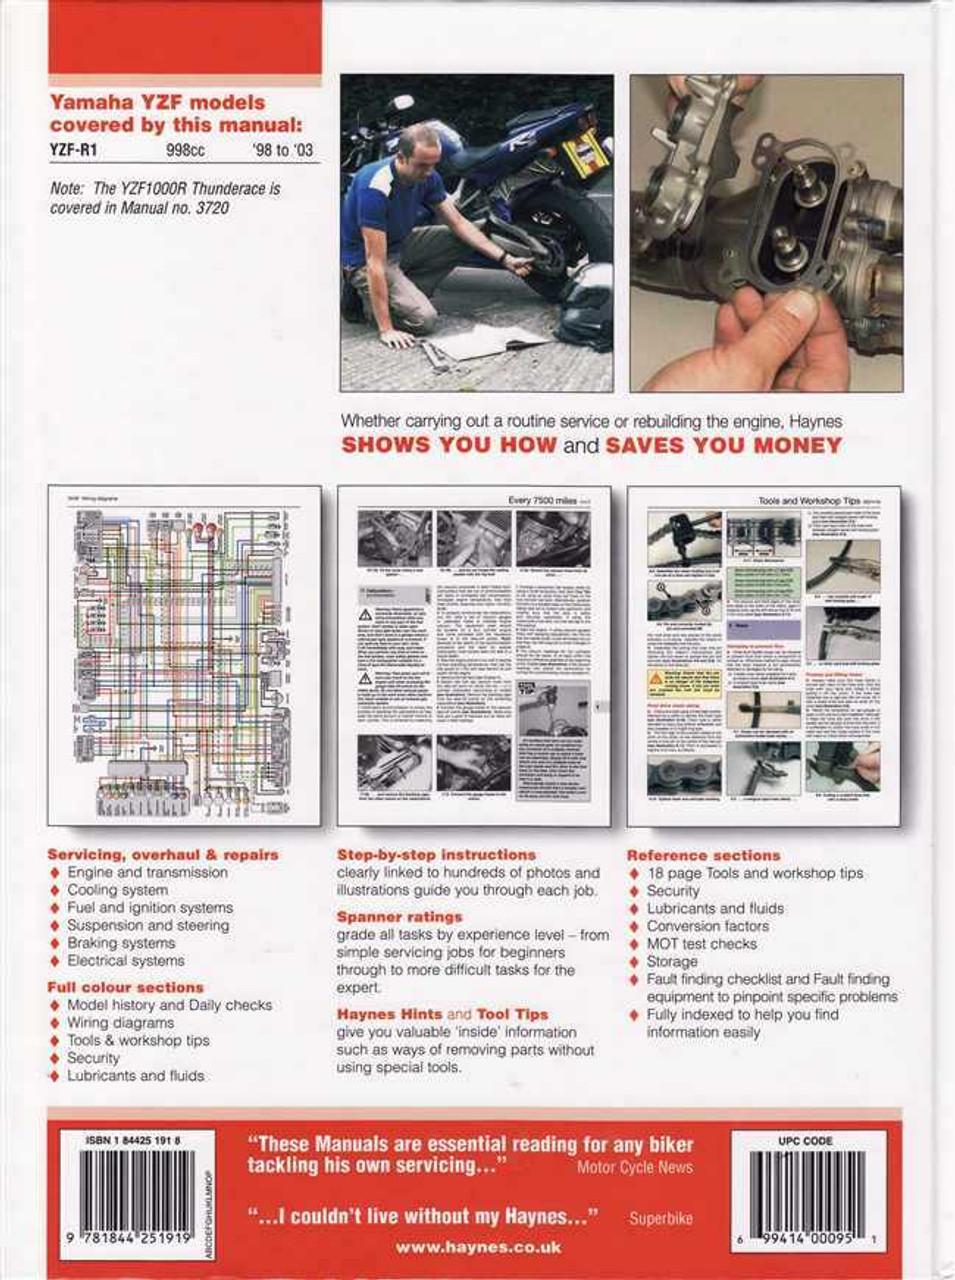 Yamaha YZF-R1 1998 - 2003 Workshop Manual on